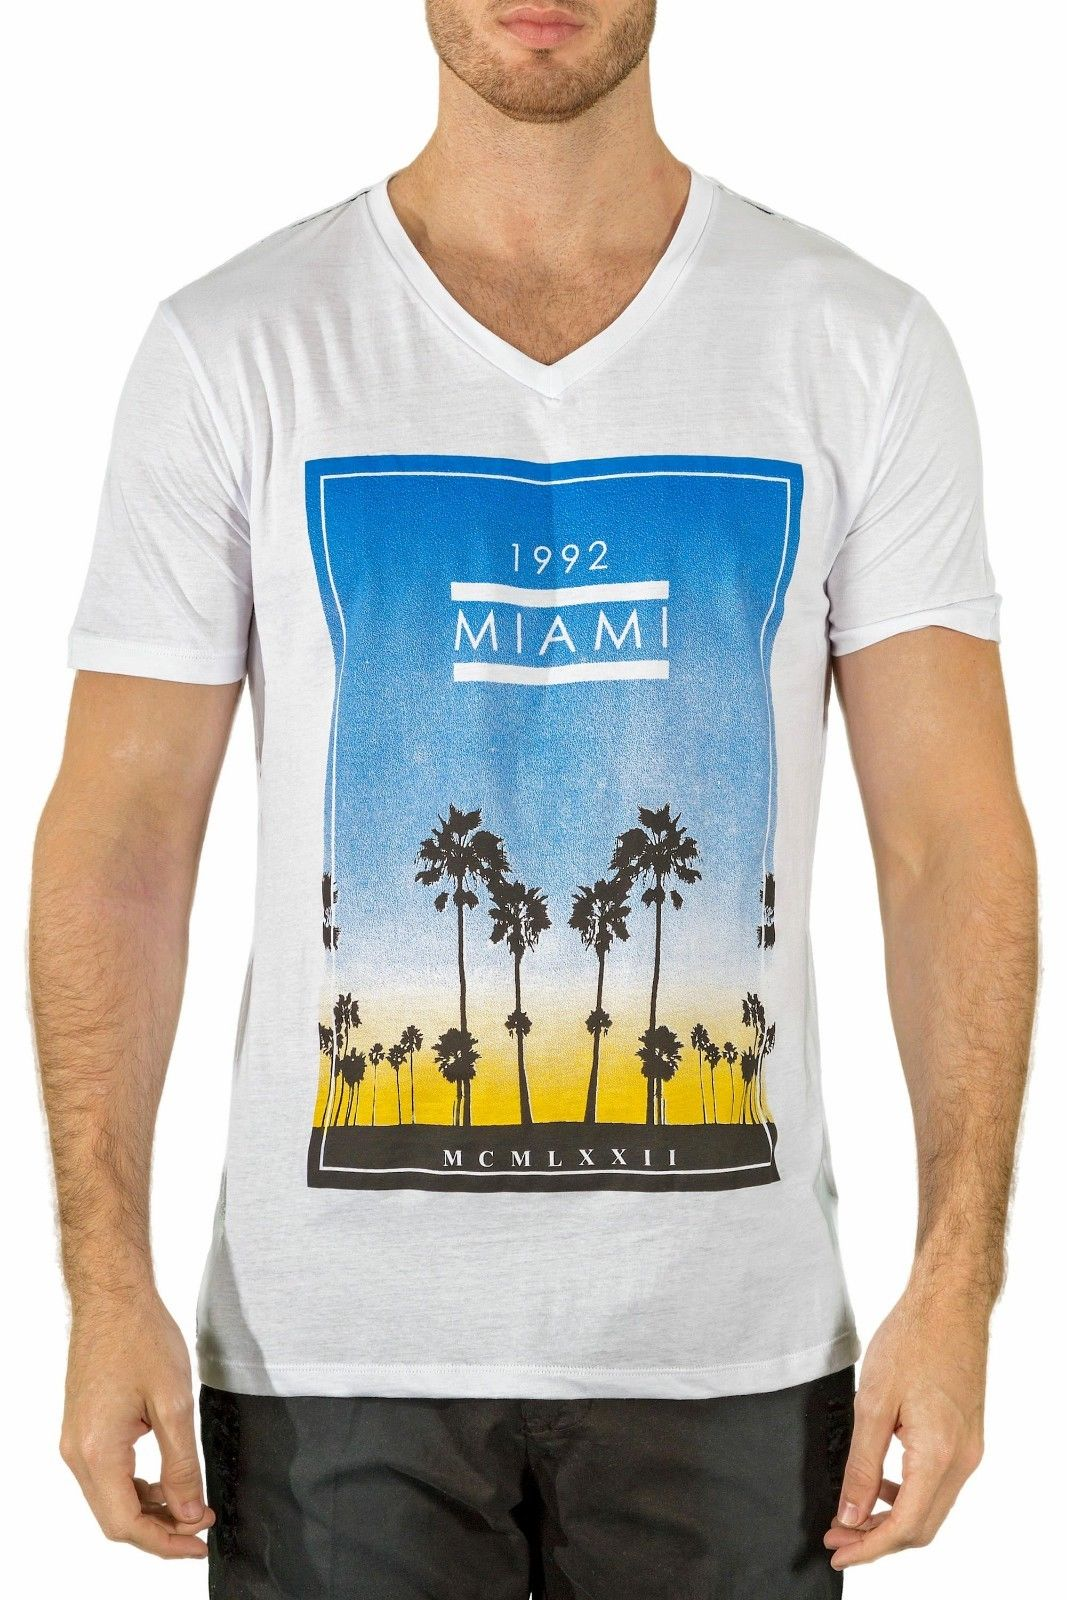 Bespoke moda Men's Fashion Slim fit t-shirt whitemulticolor sunny Miami beach Design Style New Fashion Short Sleeve